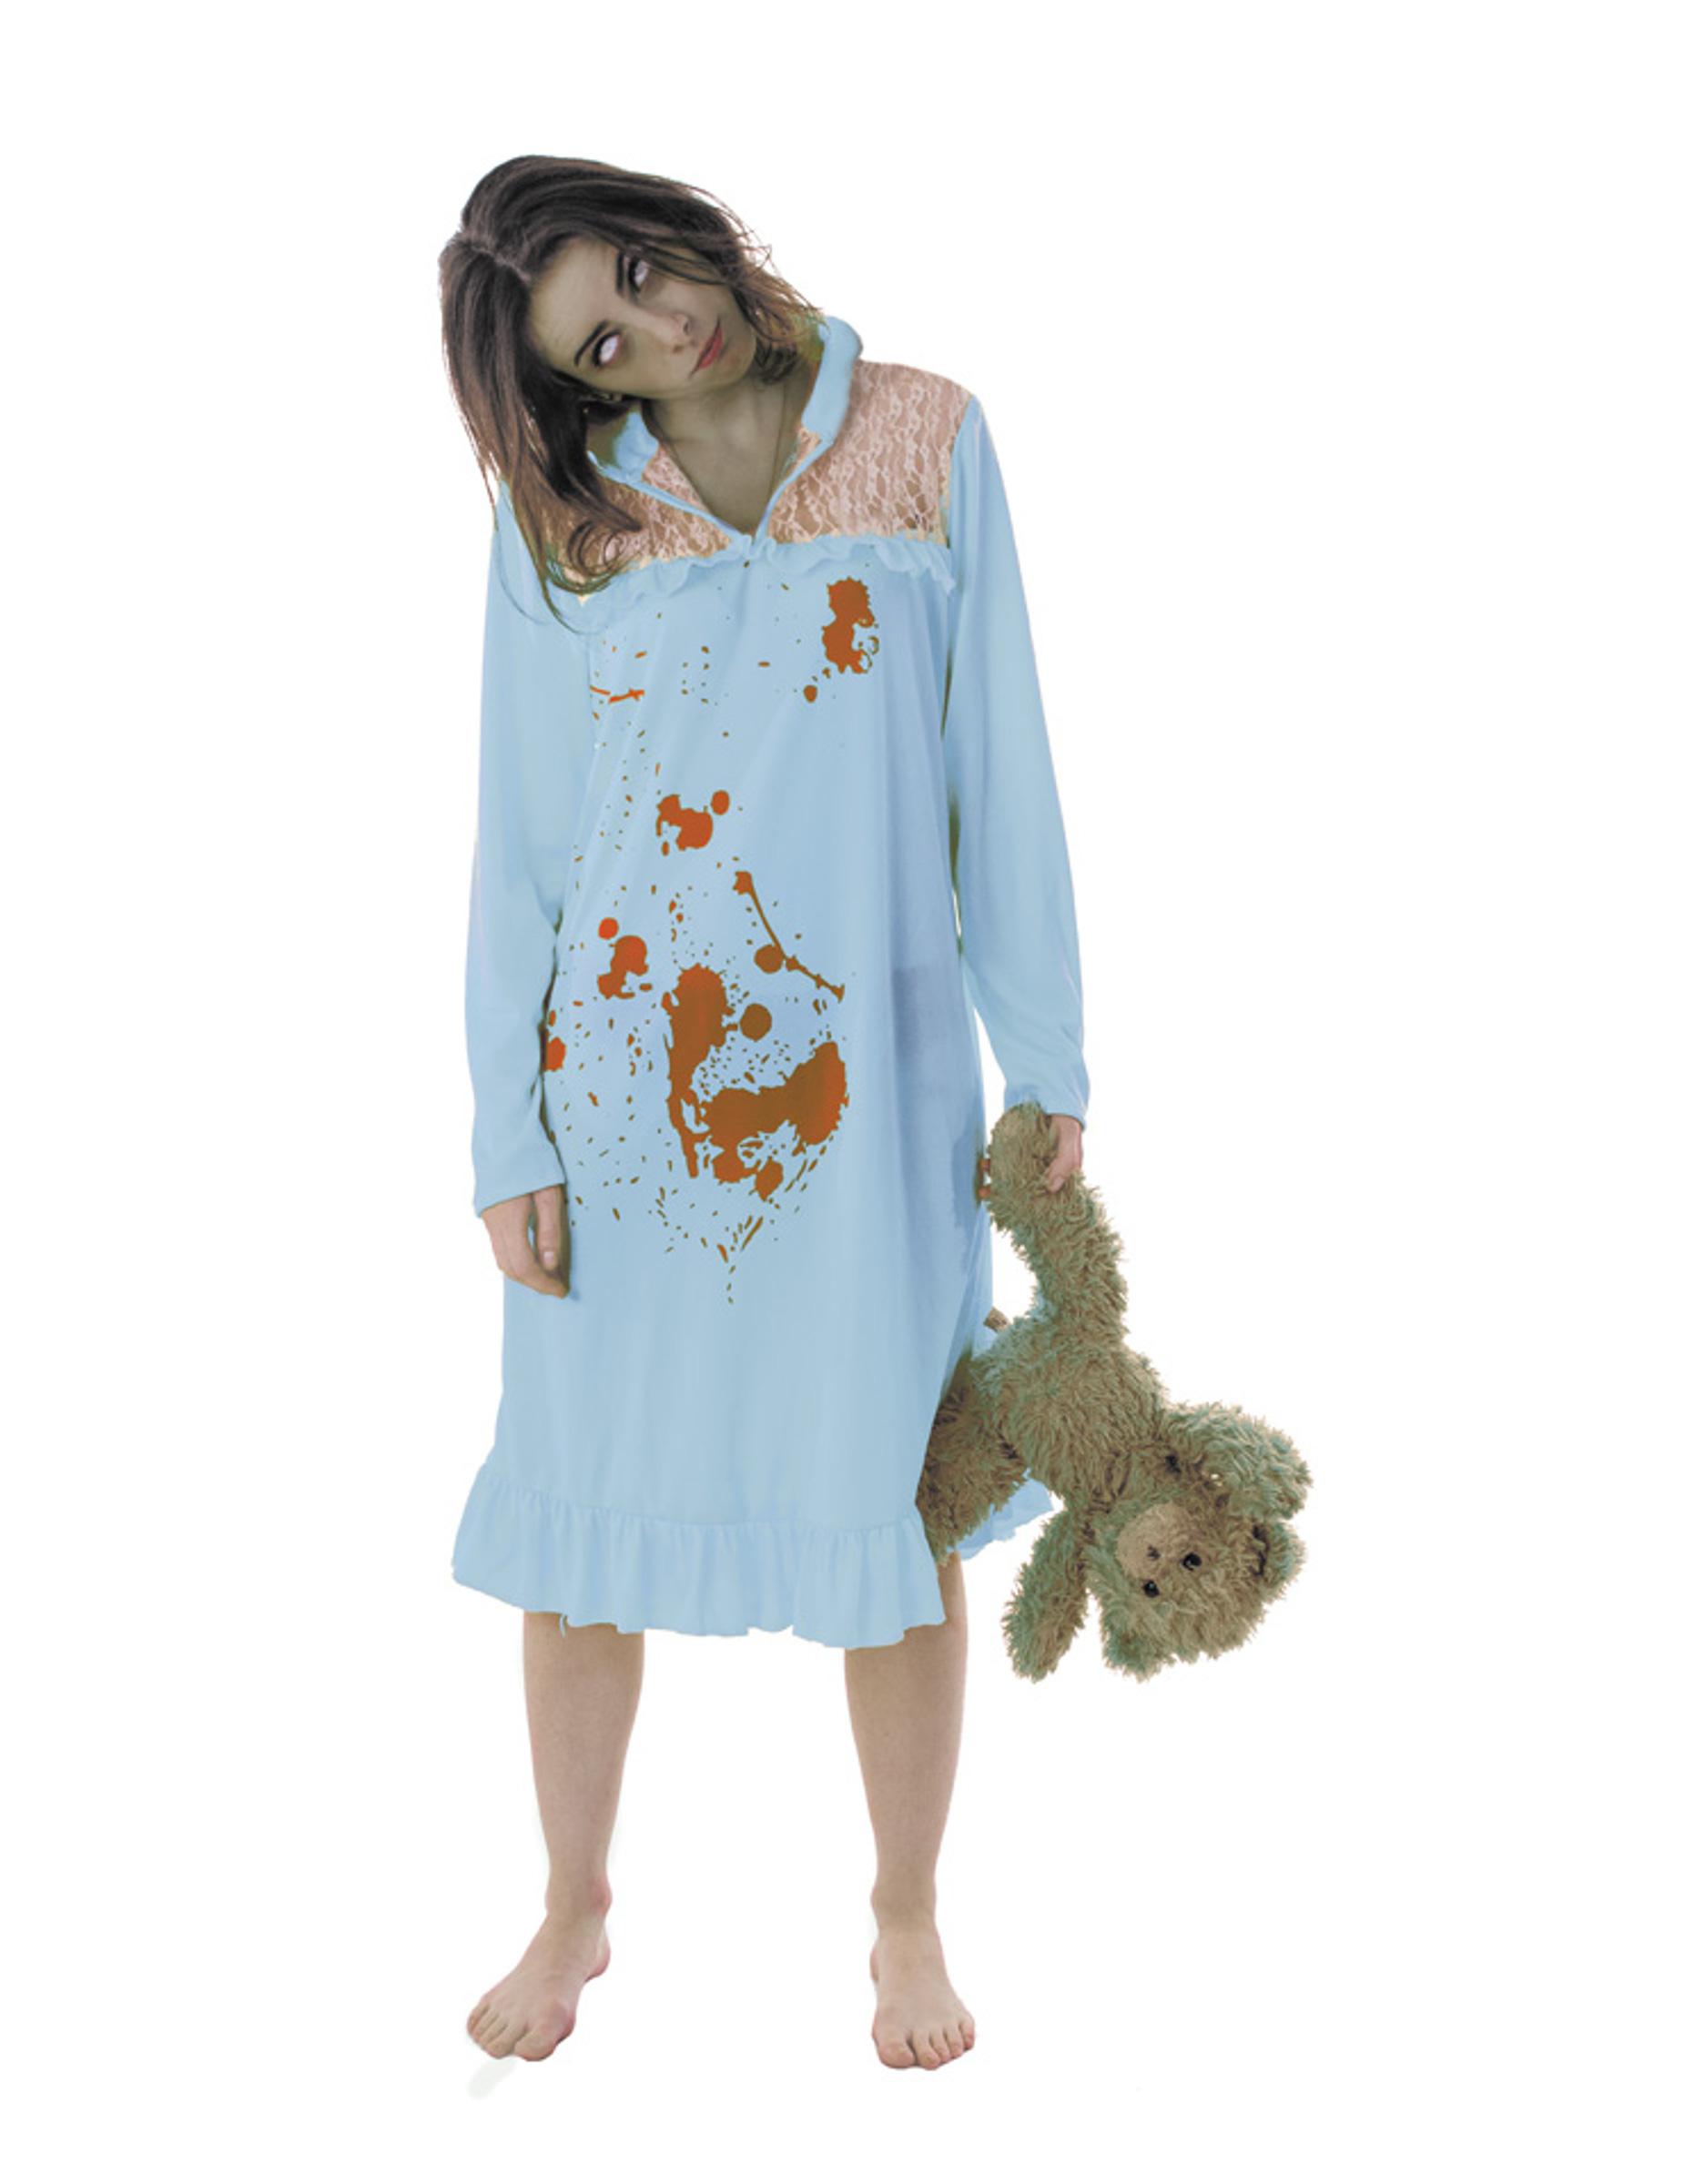 pyjama zombie kost m f r damen halloween kost me f r erwachsene und g nstige faschingskost me. Black Bedroom Furniture Sets. Home Design Ideas